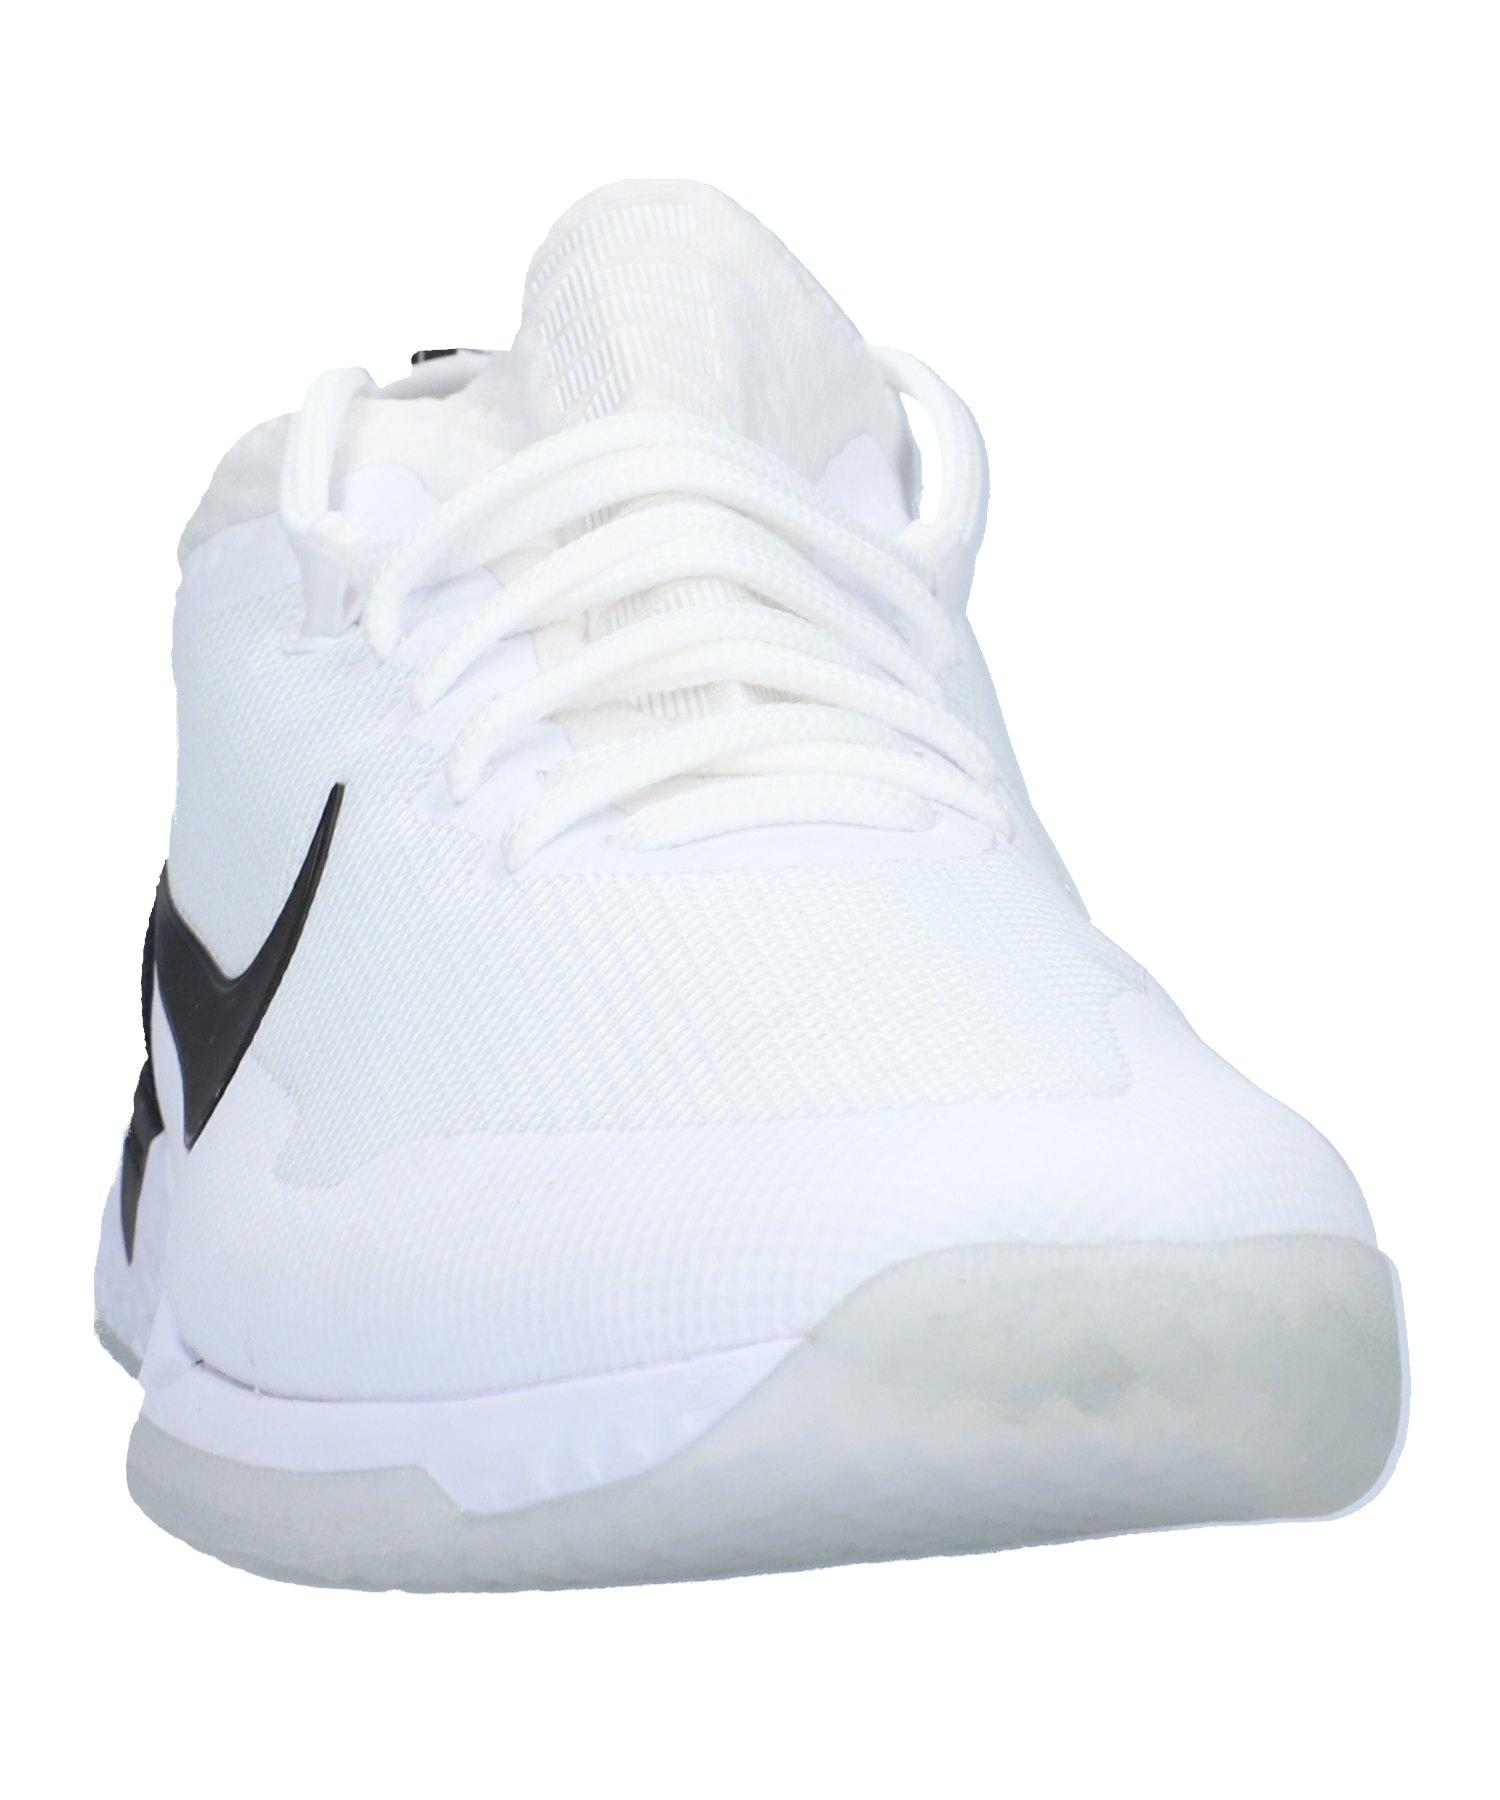 Sneaker Nike F F101 Schwarz cReact Weiss Oyvm08nwN